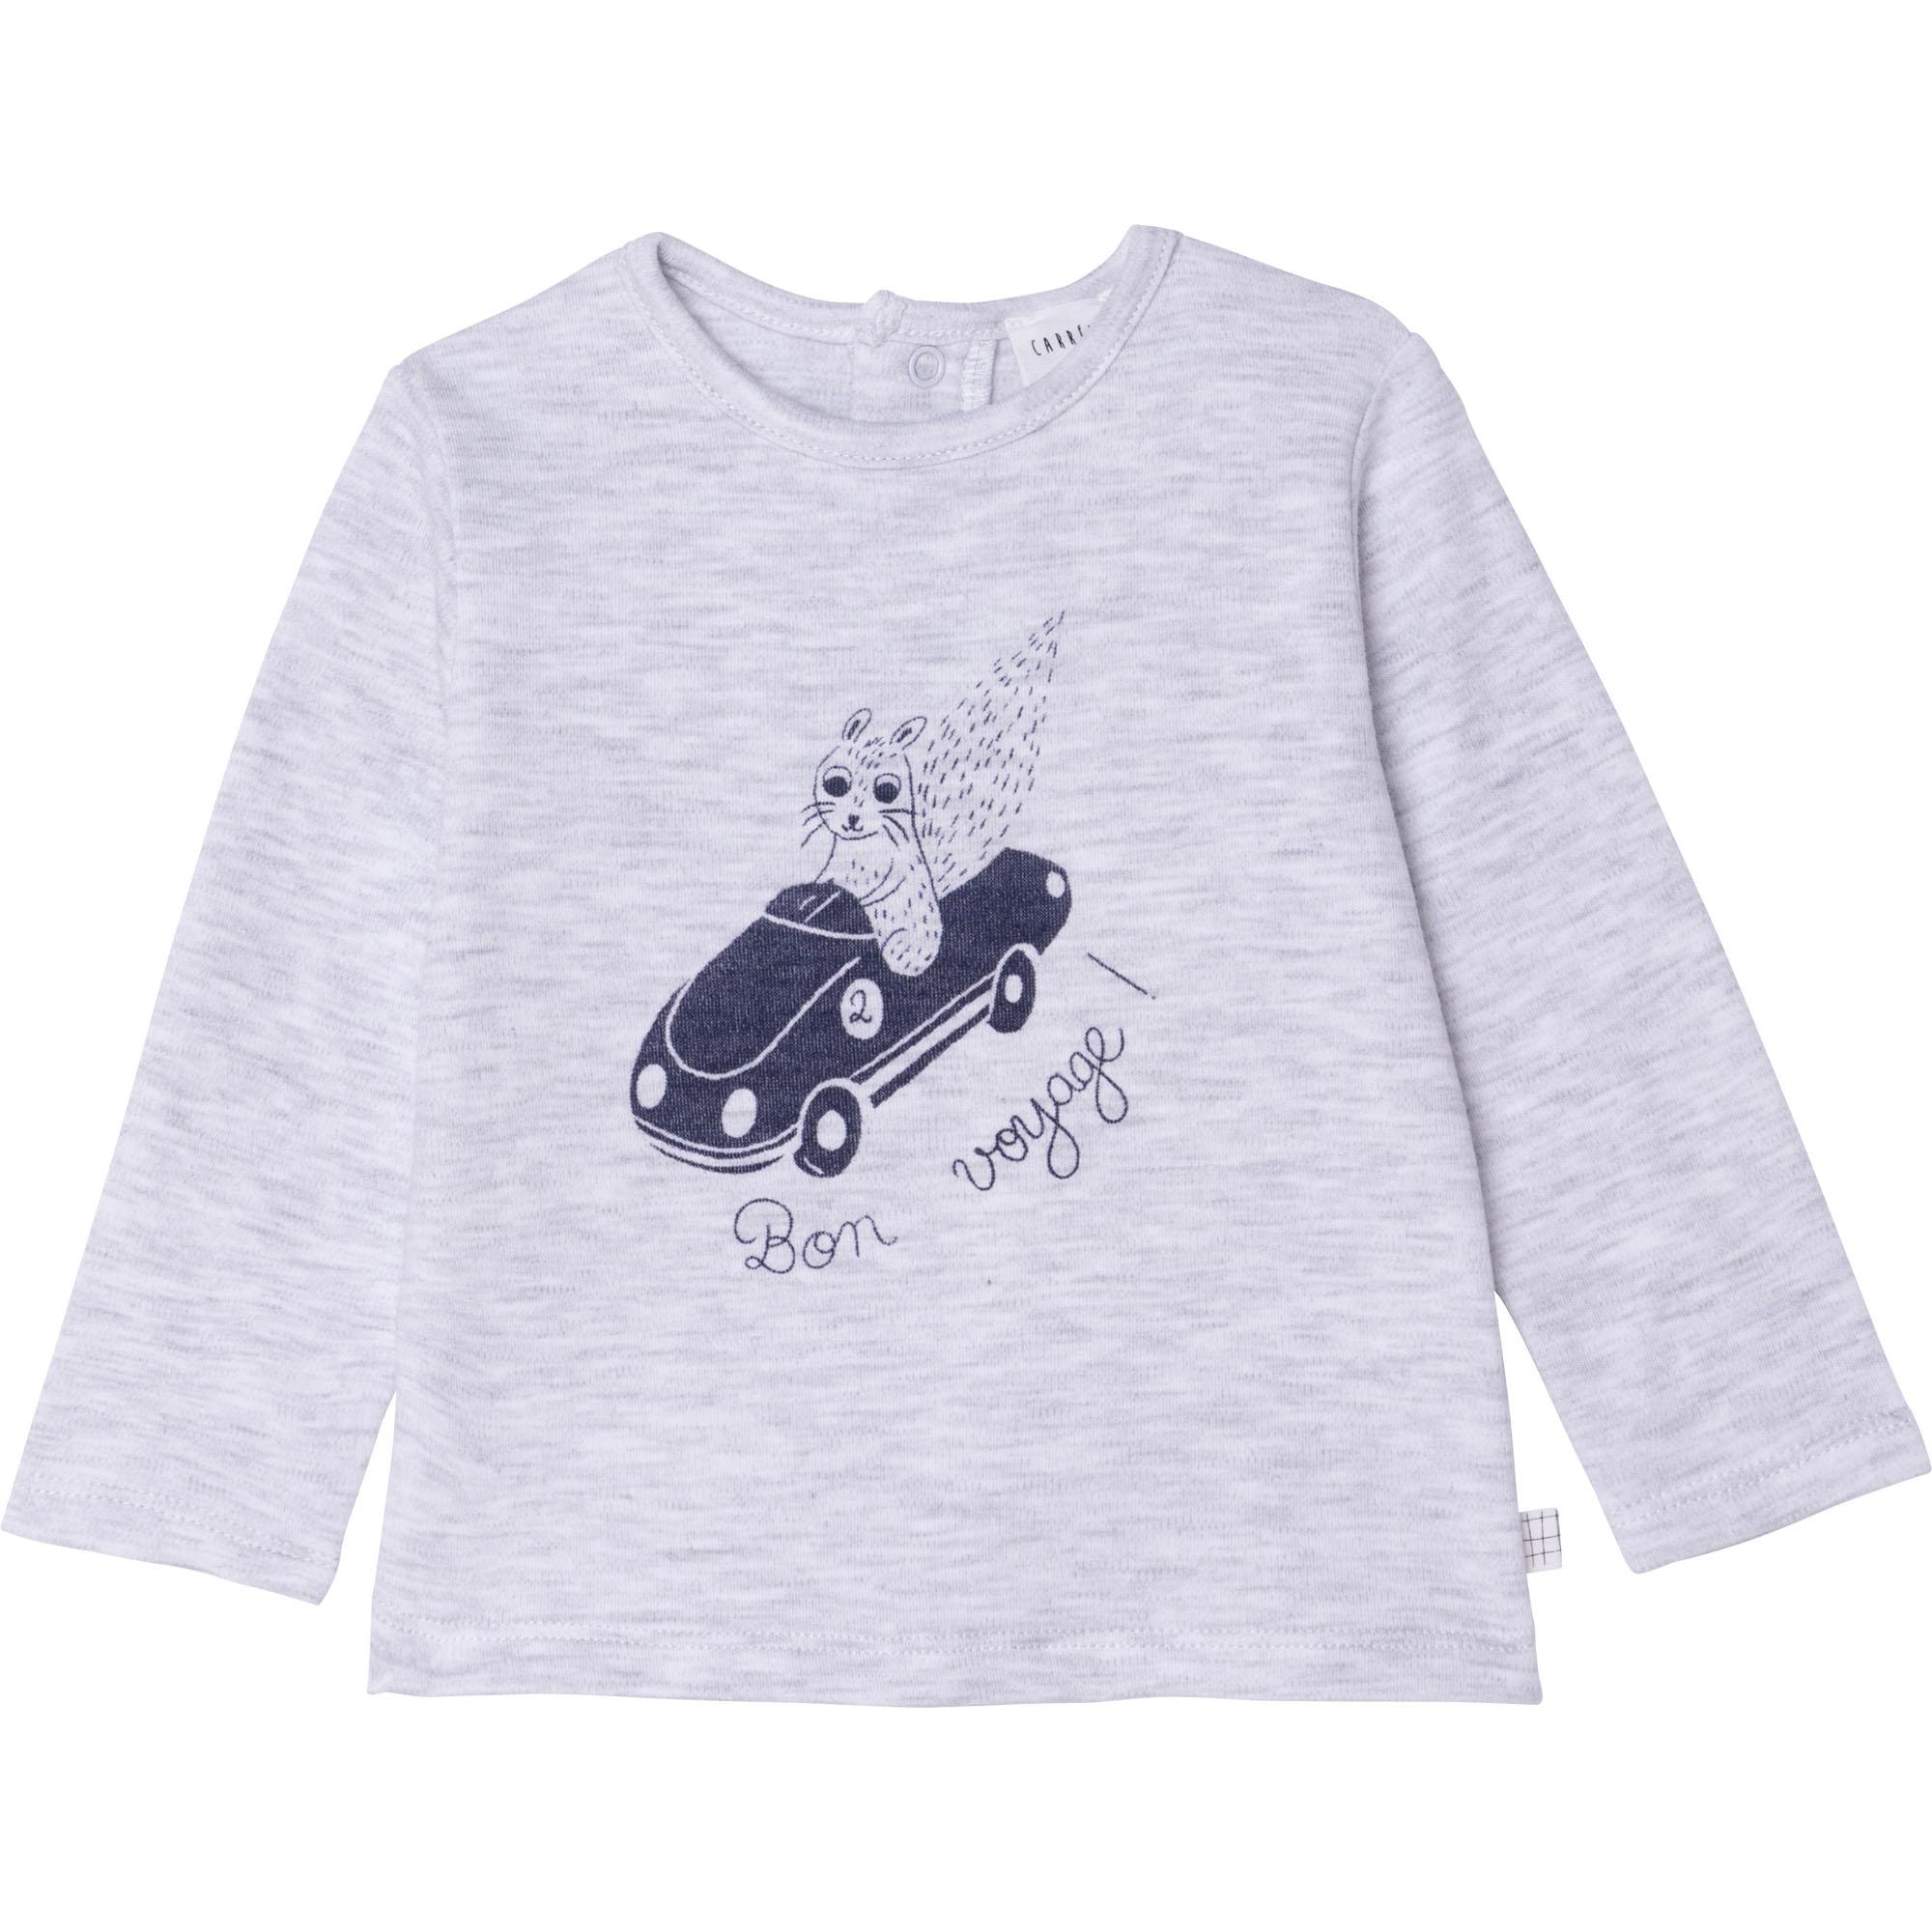 LONG SLEEVE T-SHIRT CARREMENT BEAU for BOY